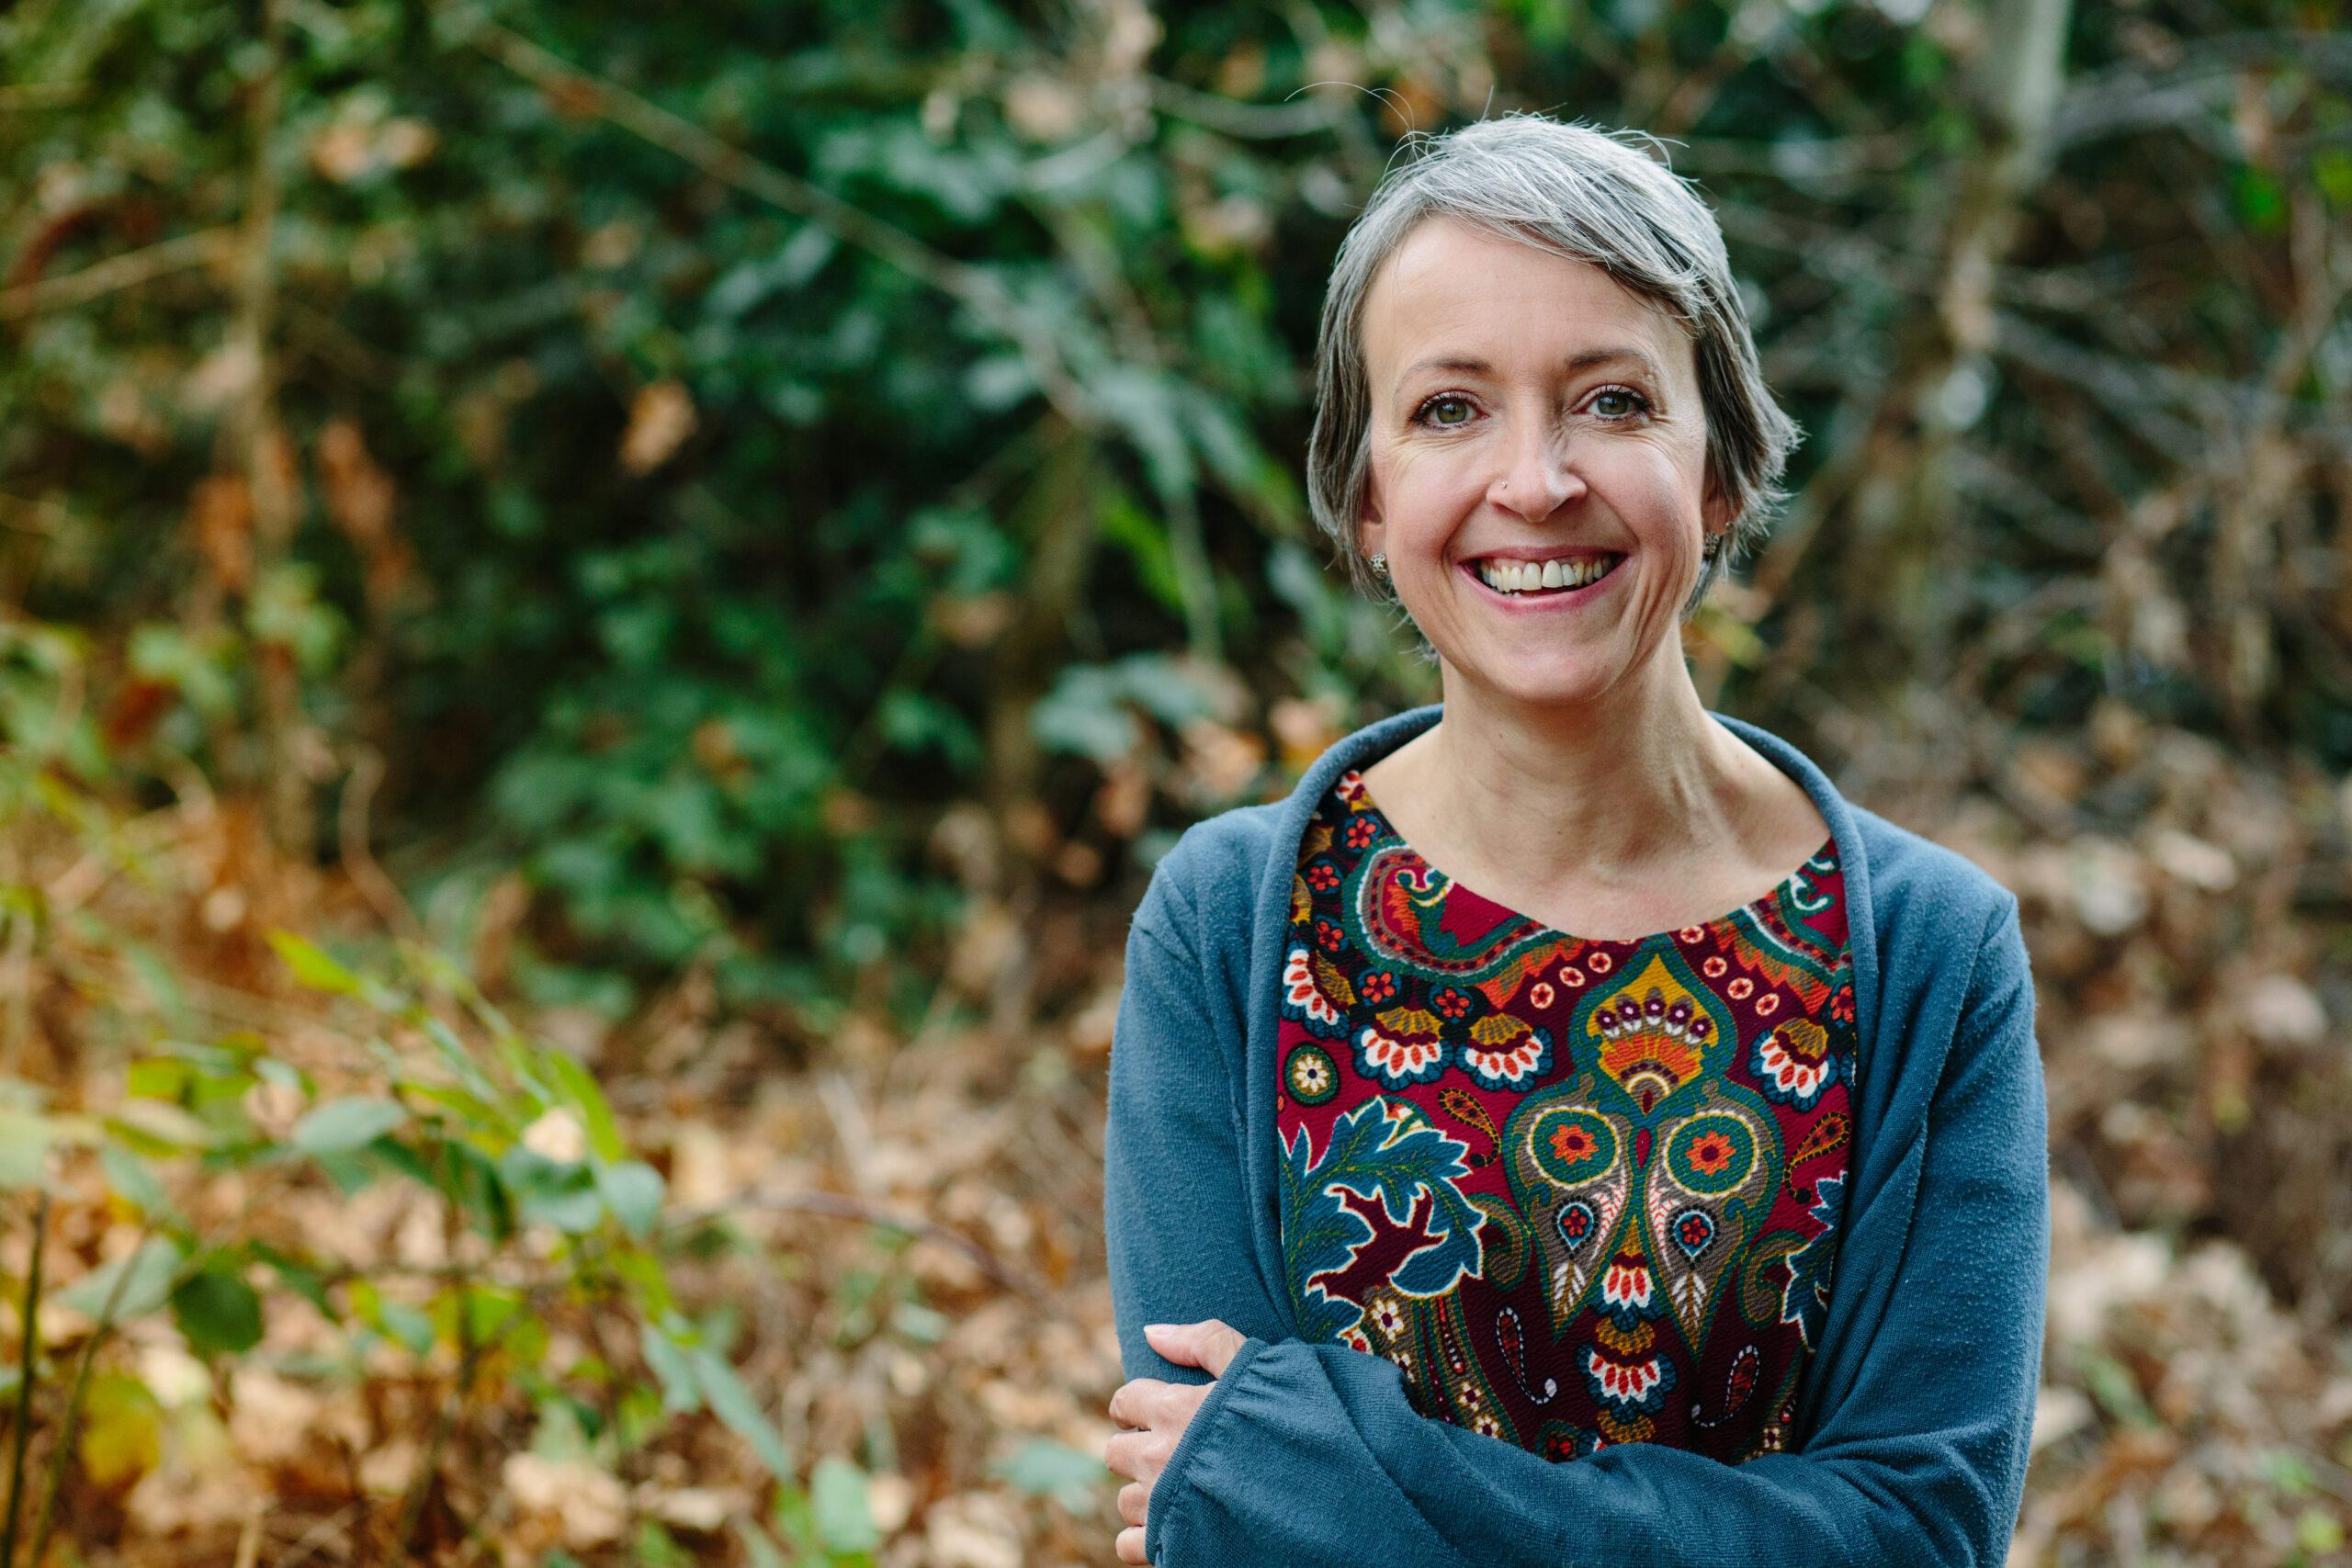 Firewalking Looking beyond your limitations – Lottie Moore